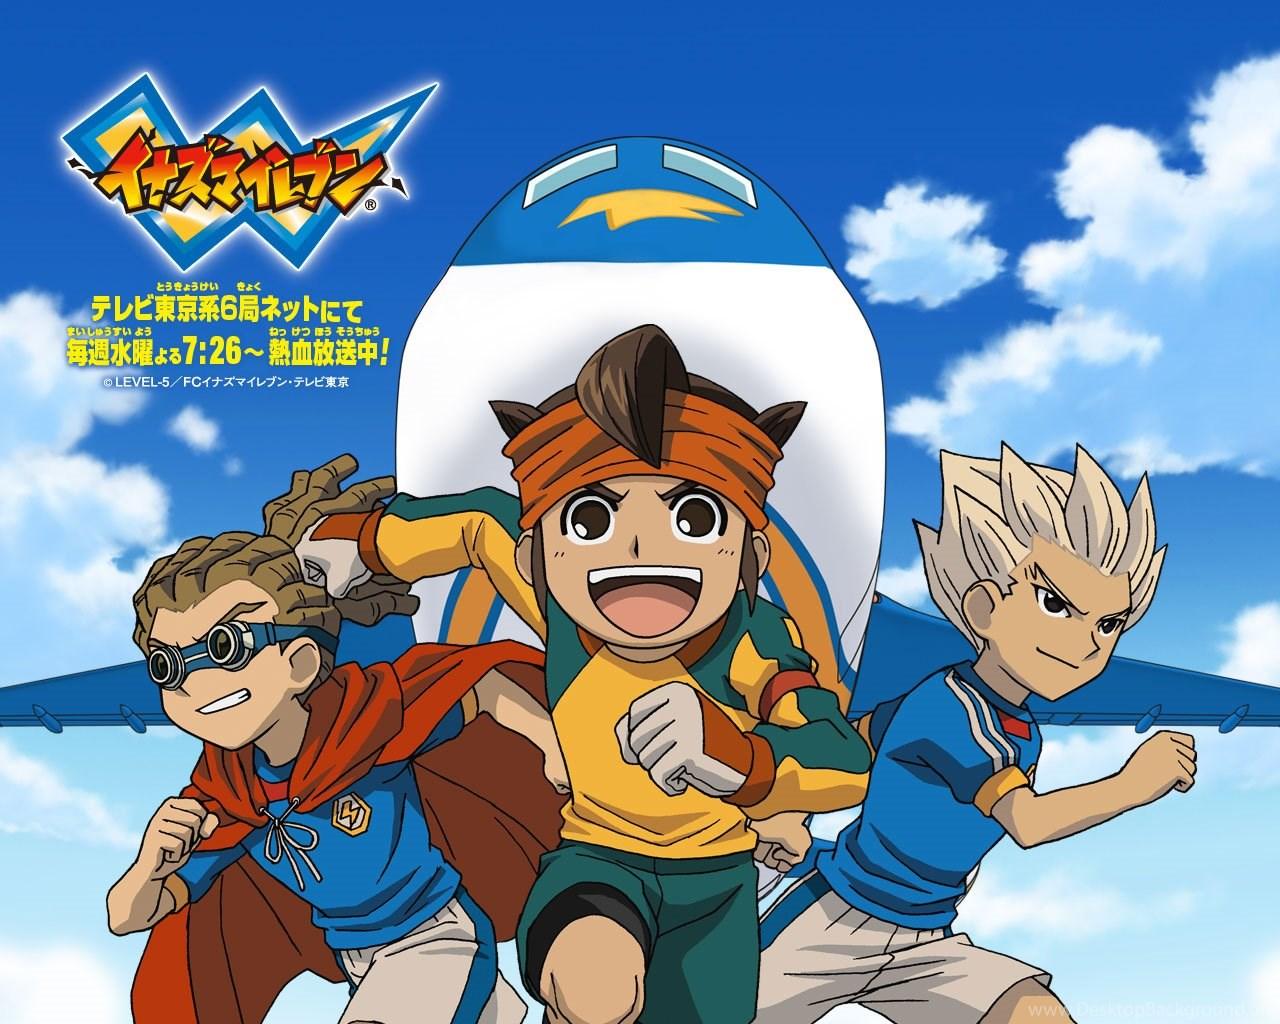 Inazuma Eleven Anime Wallpapers 37029272 Fanpop Desktop Background